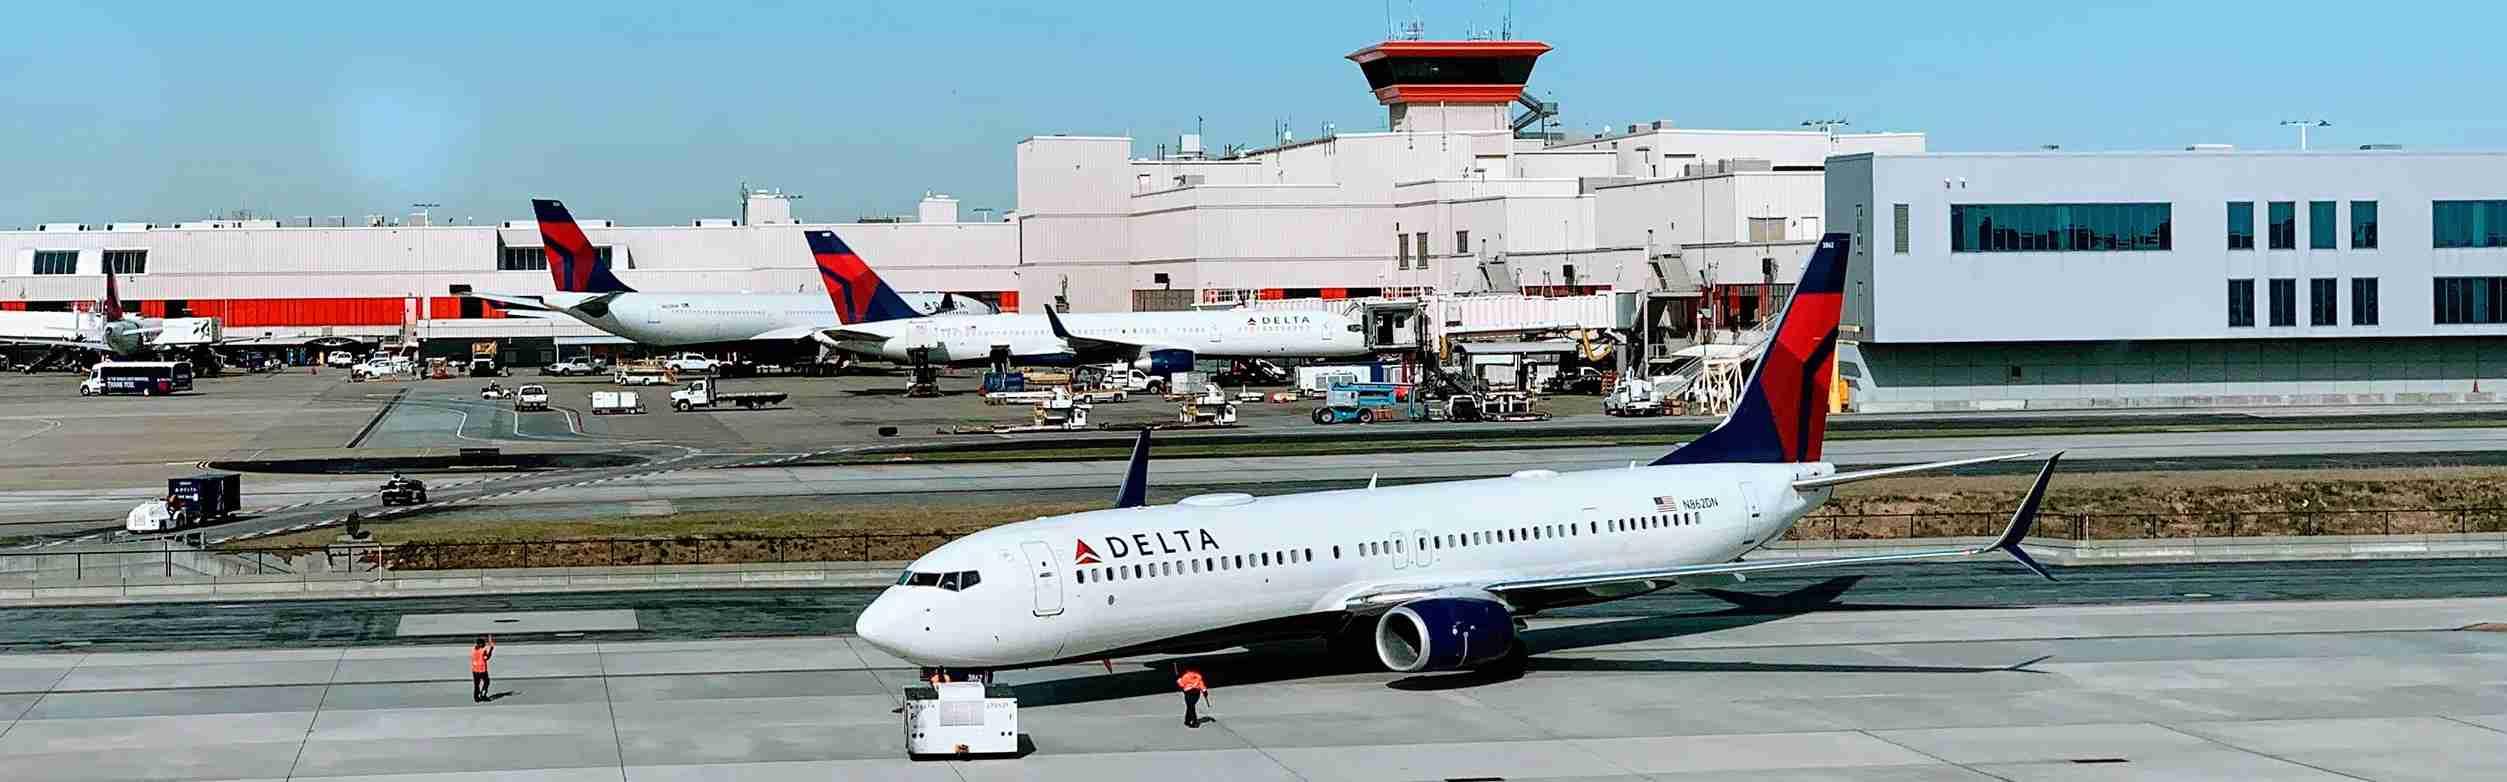 delta-atlanta-atl-airport-jet-jets-airplane-plane